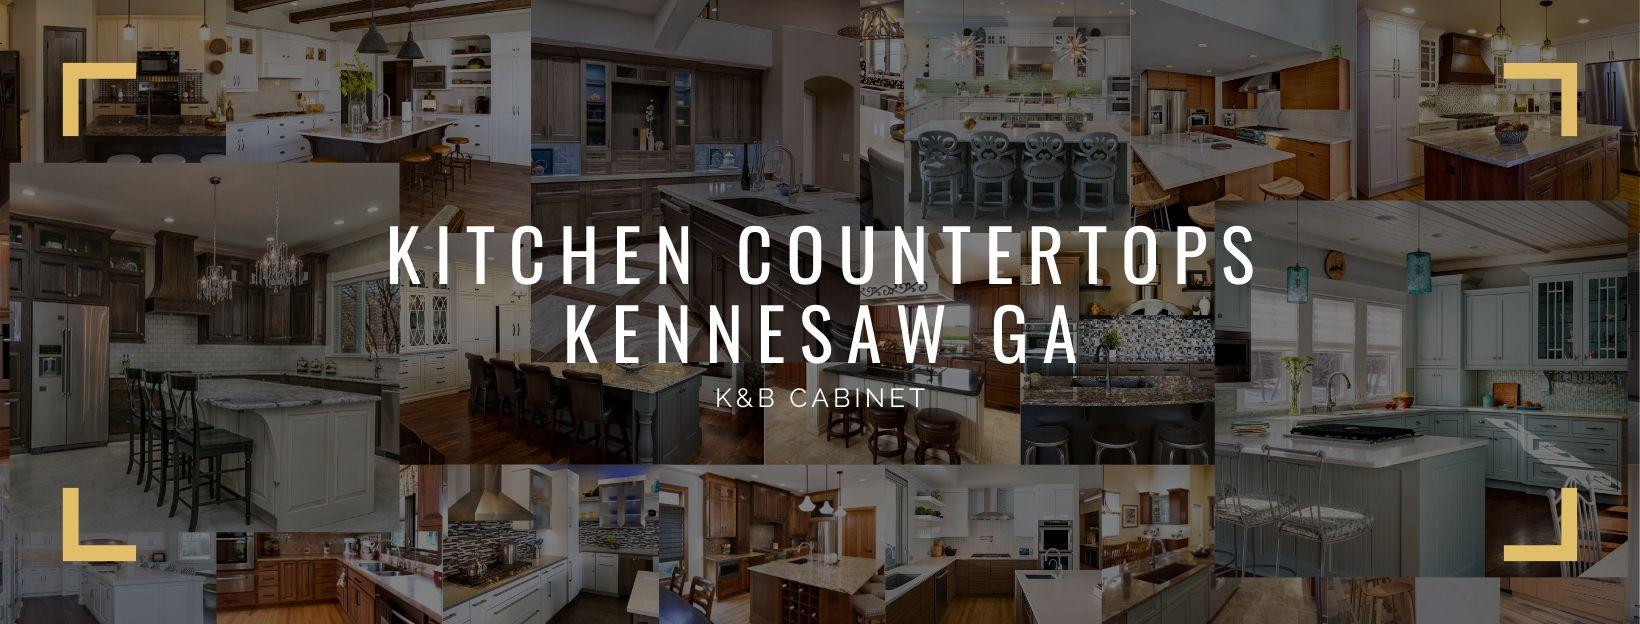 Kitchen Countertops Kennesaw GA